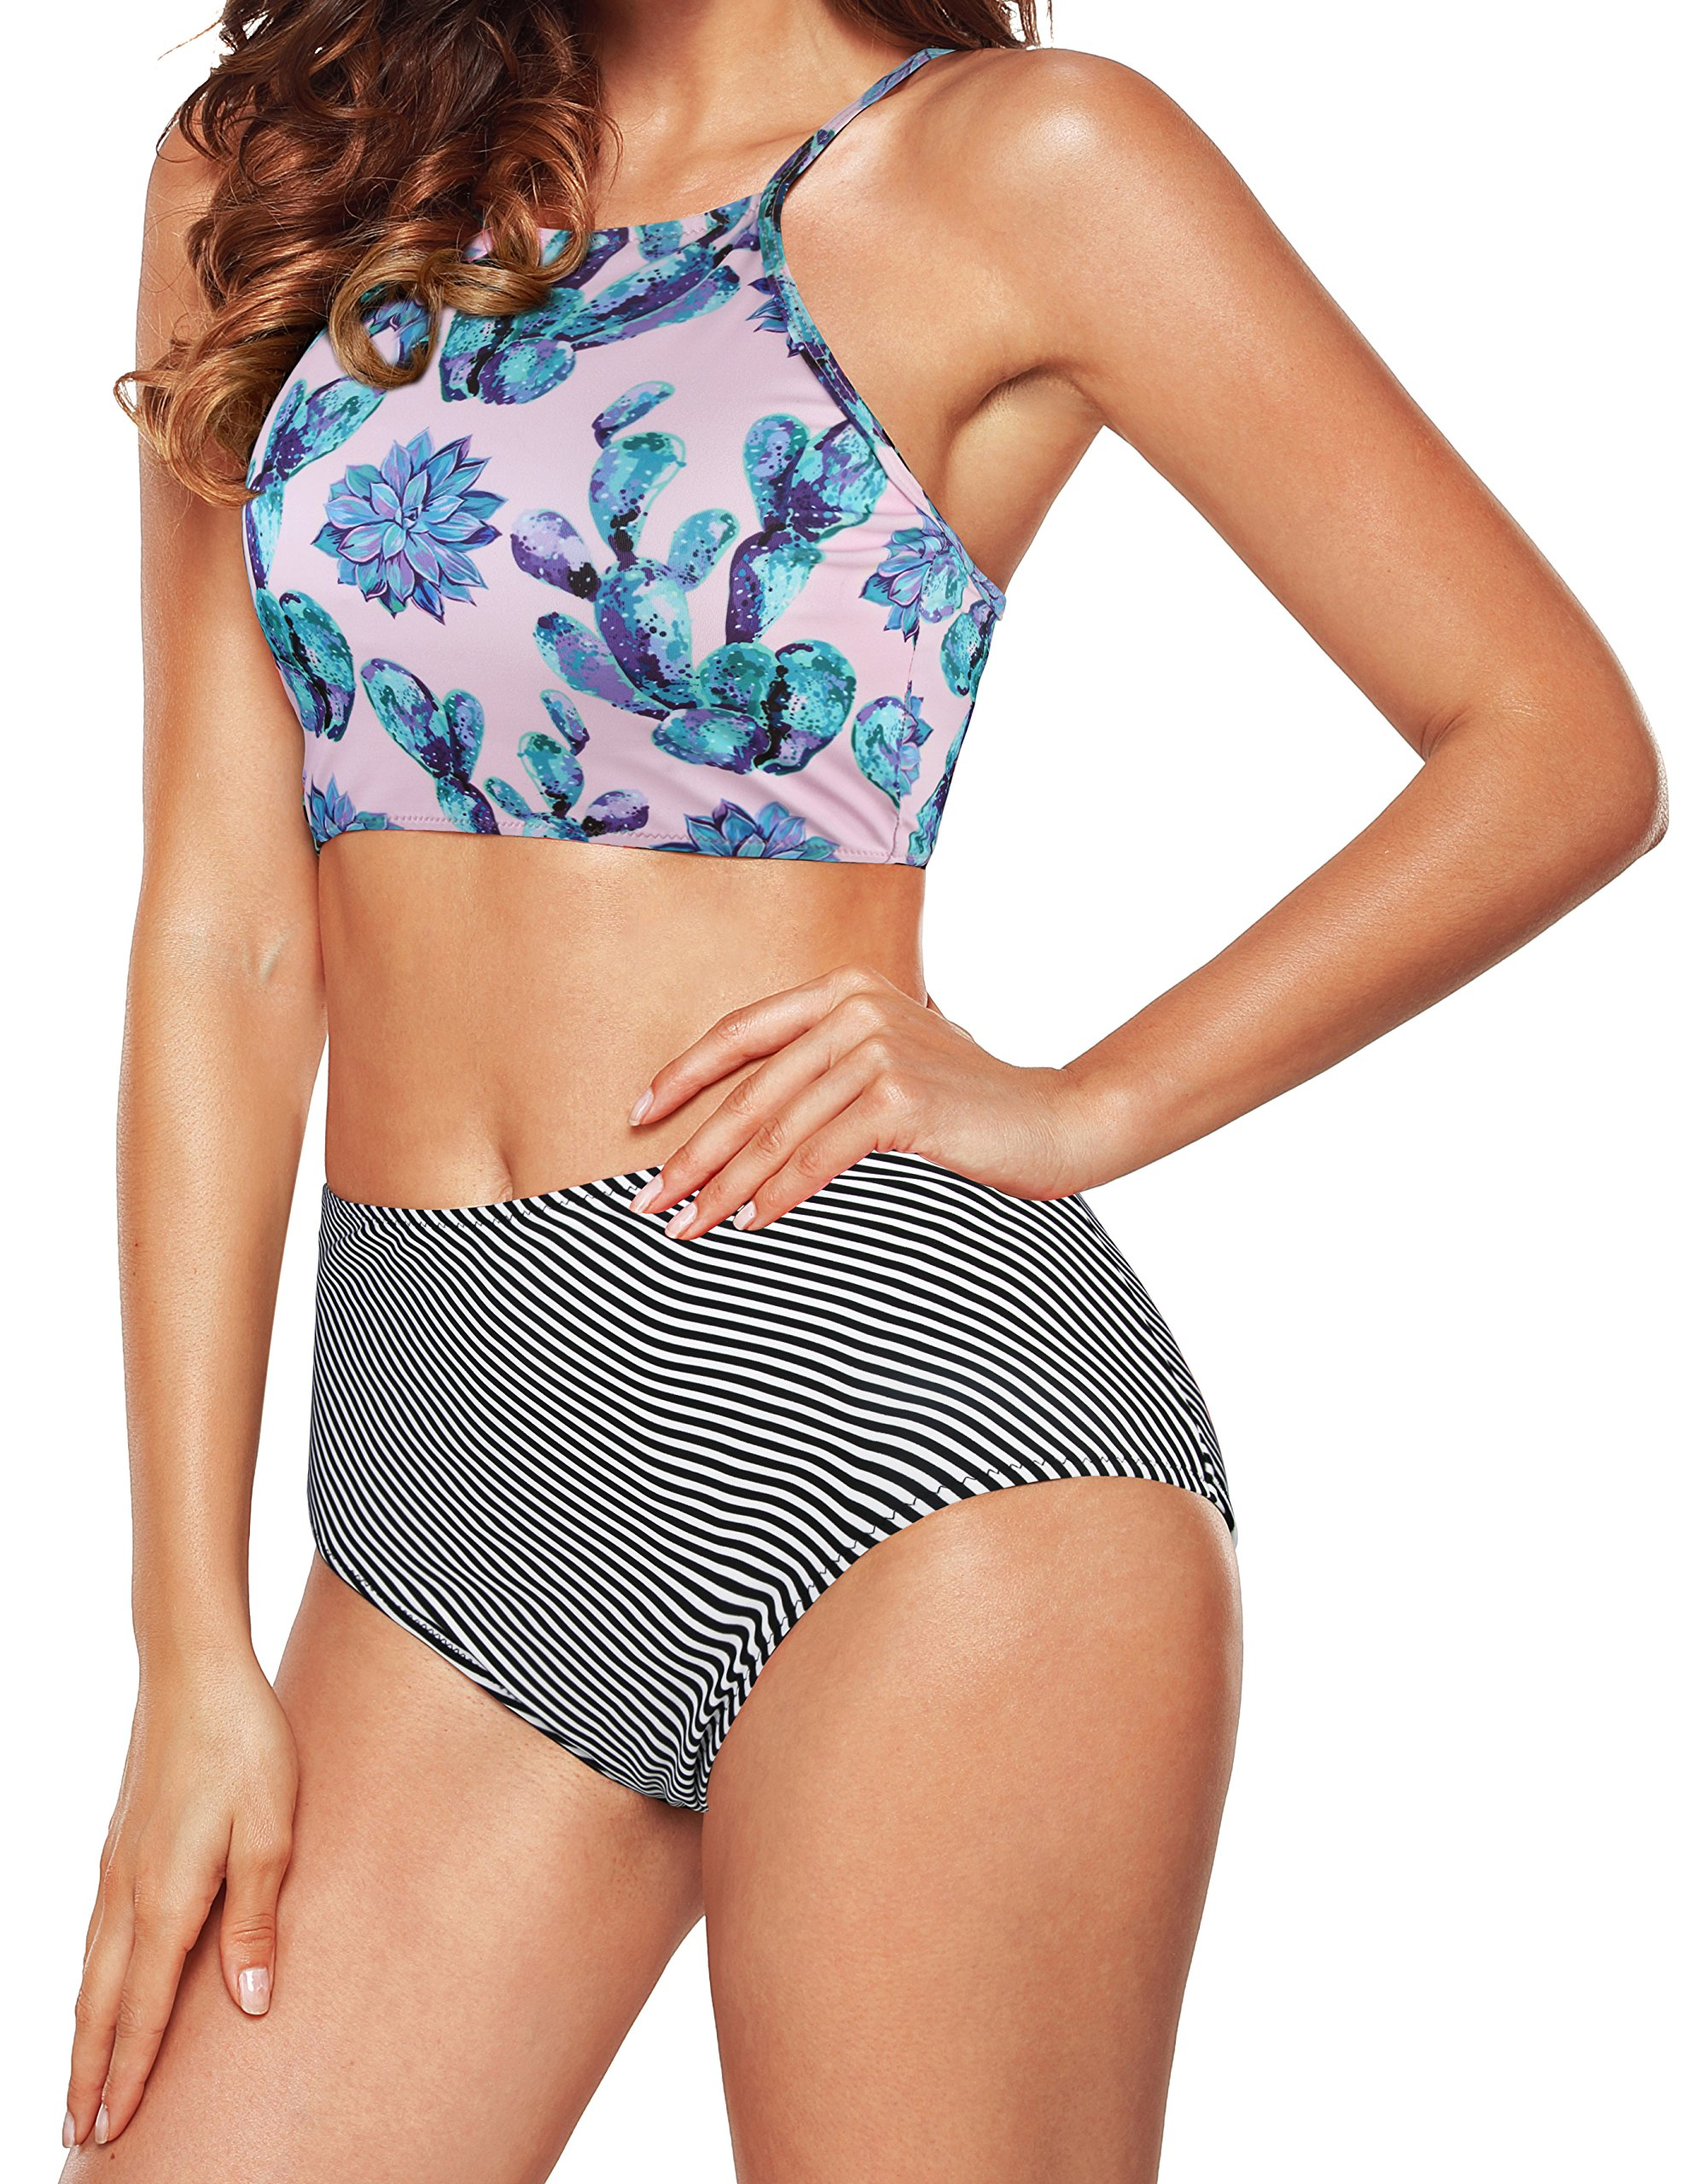 ebc2b1efc658e Galleon - Angerella Crop Top Swimsuits Banded Bikini Two Piece Cute Swimwear  Juniors Bathing Suit Pink,2XL